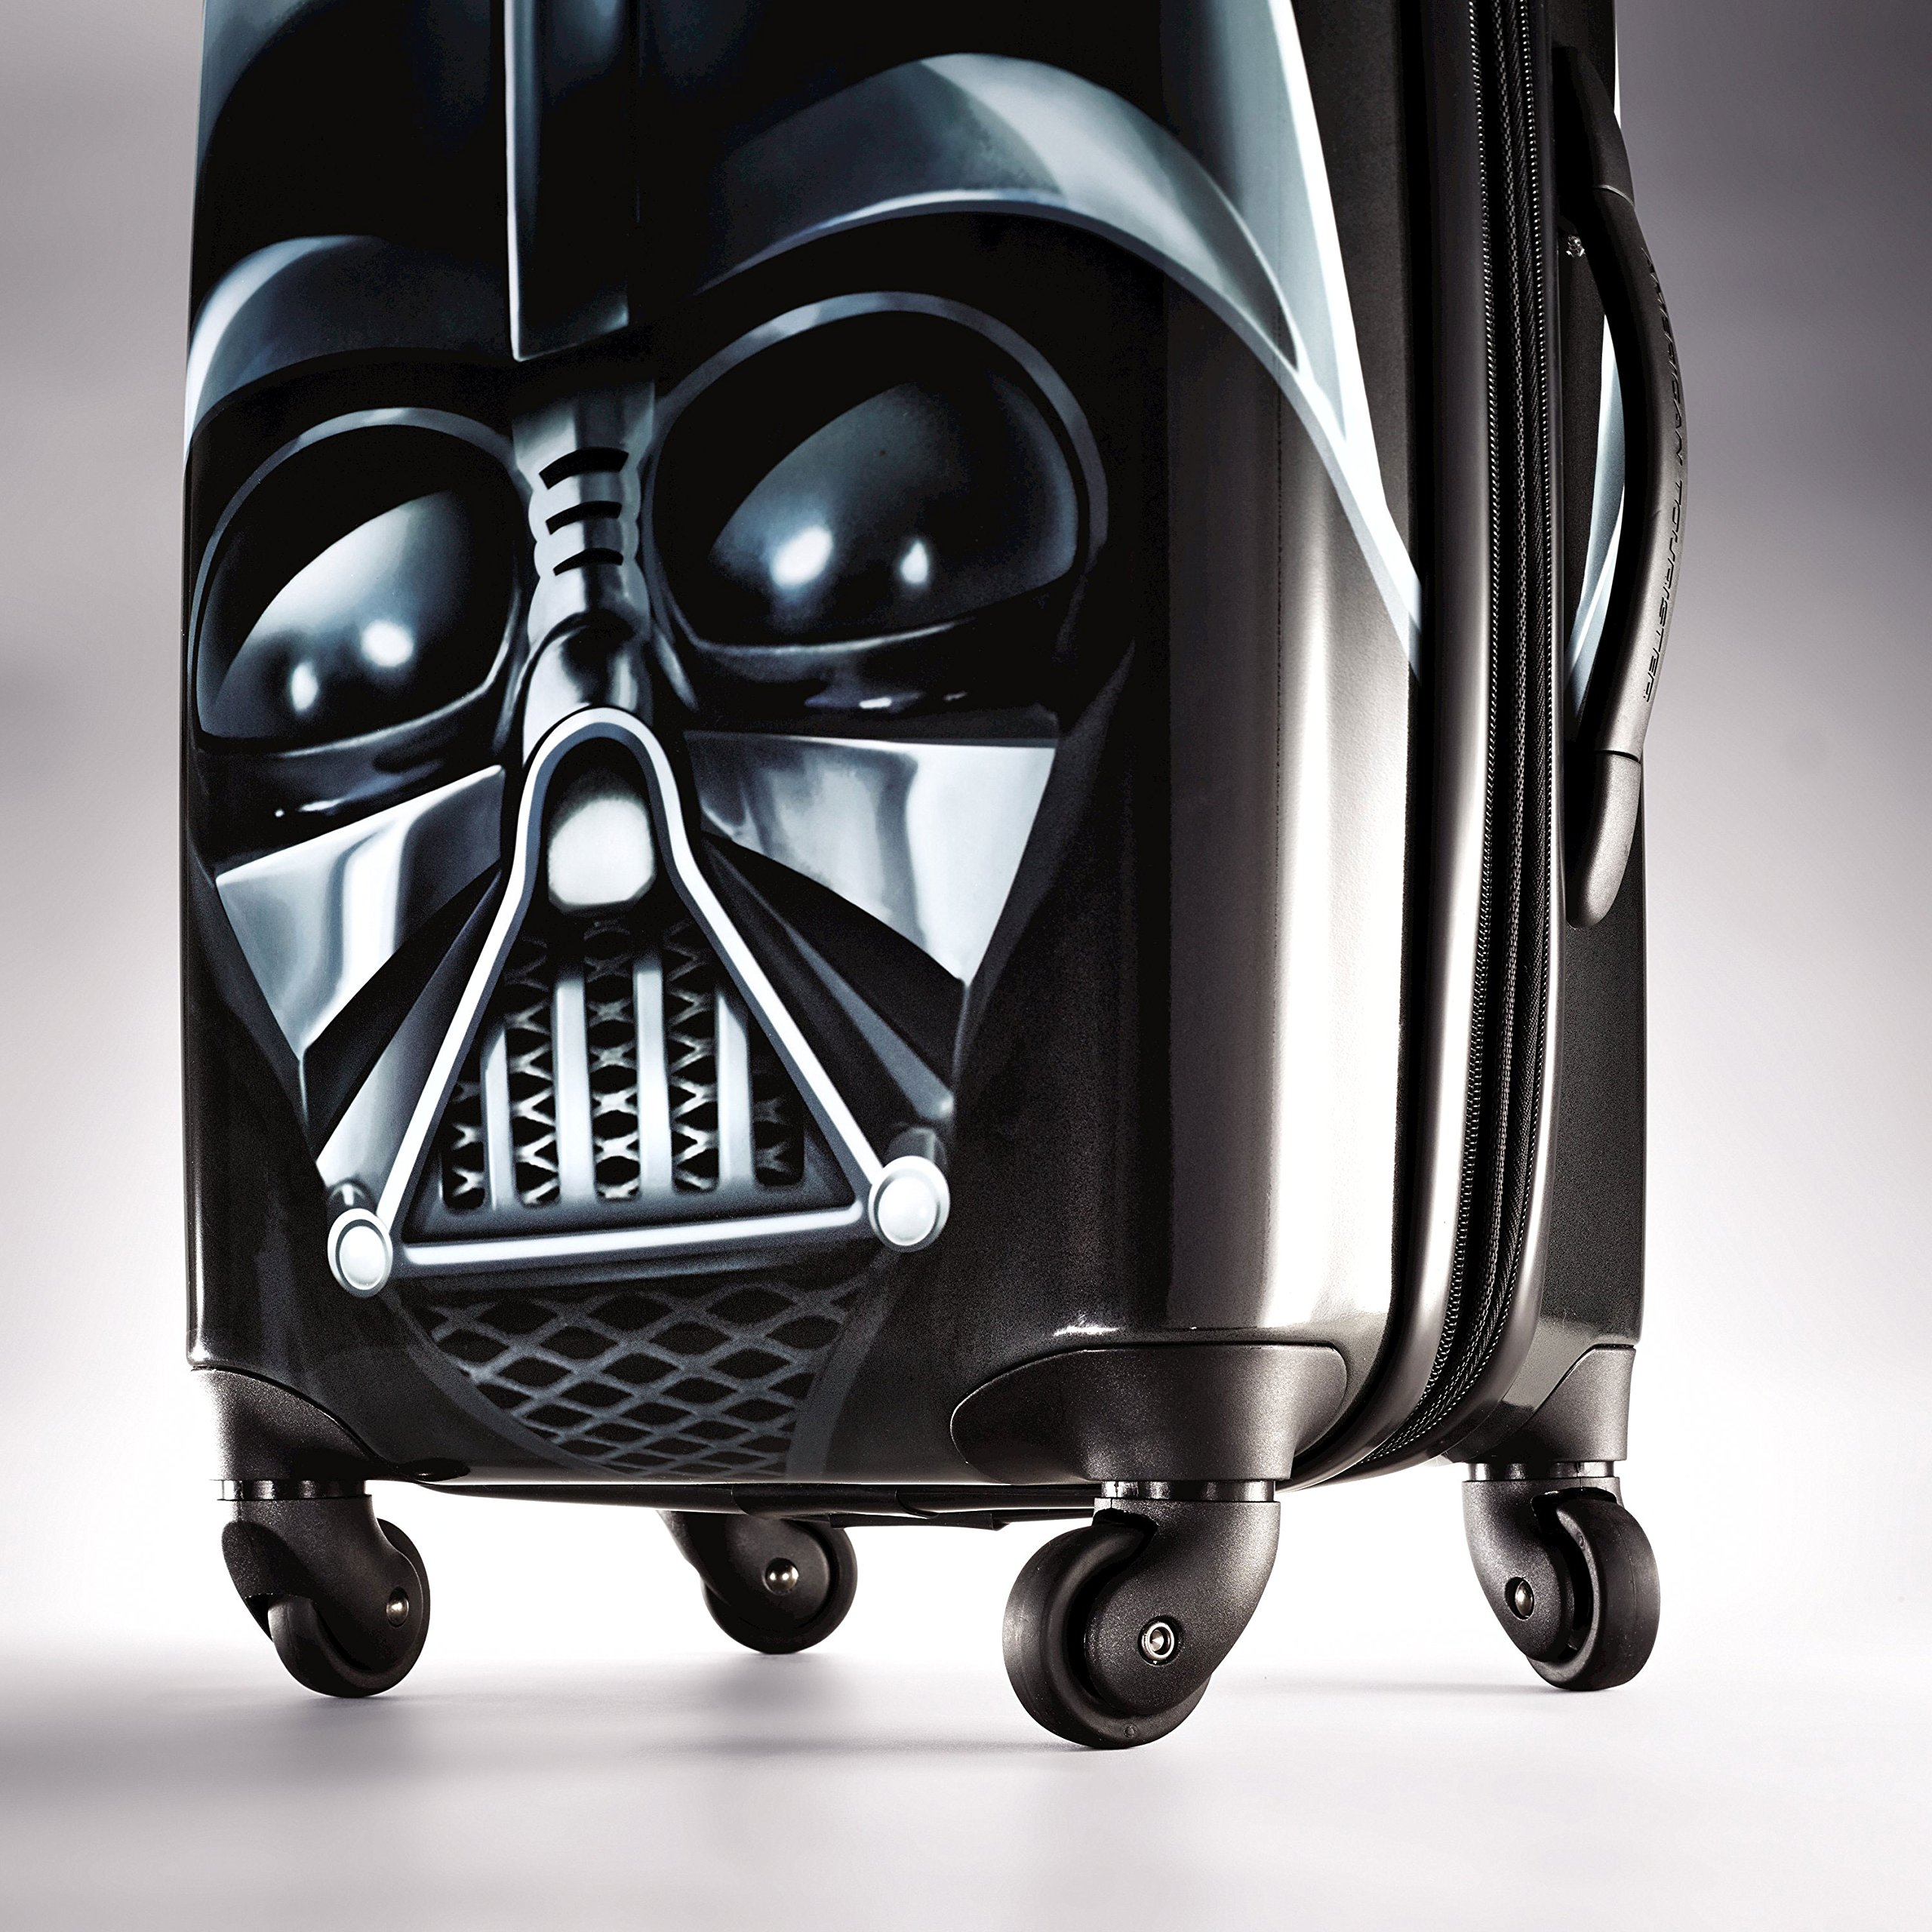 68b2a6e3c American Tourister Star Wars 21